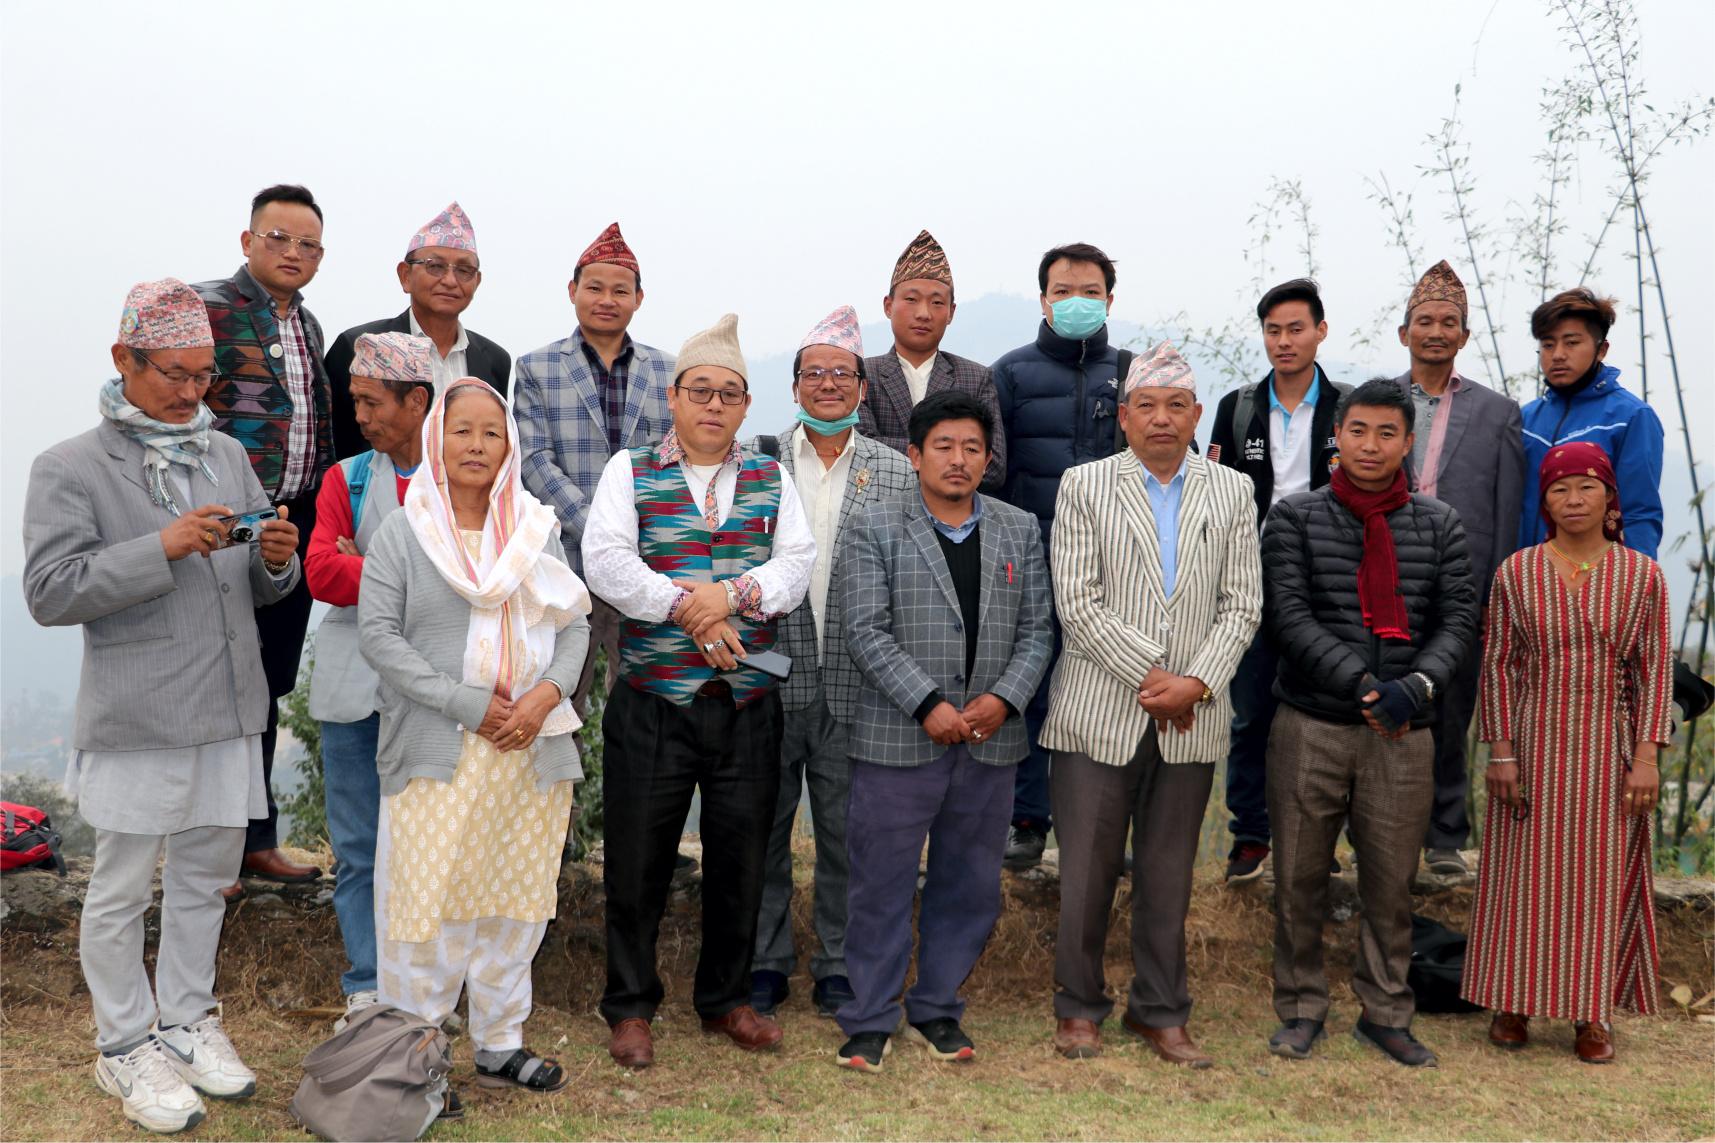 खोटाङमा किरात धर्म लेखौं अभियान समिति गठन